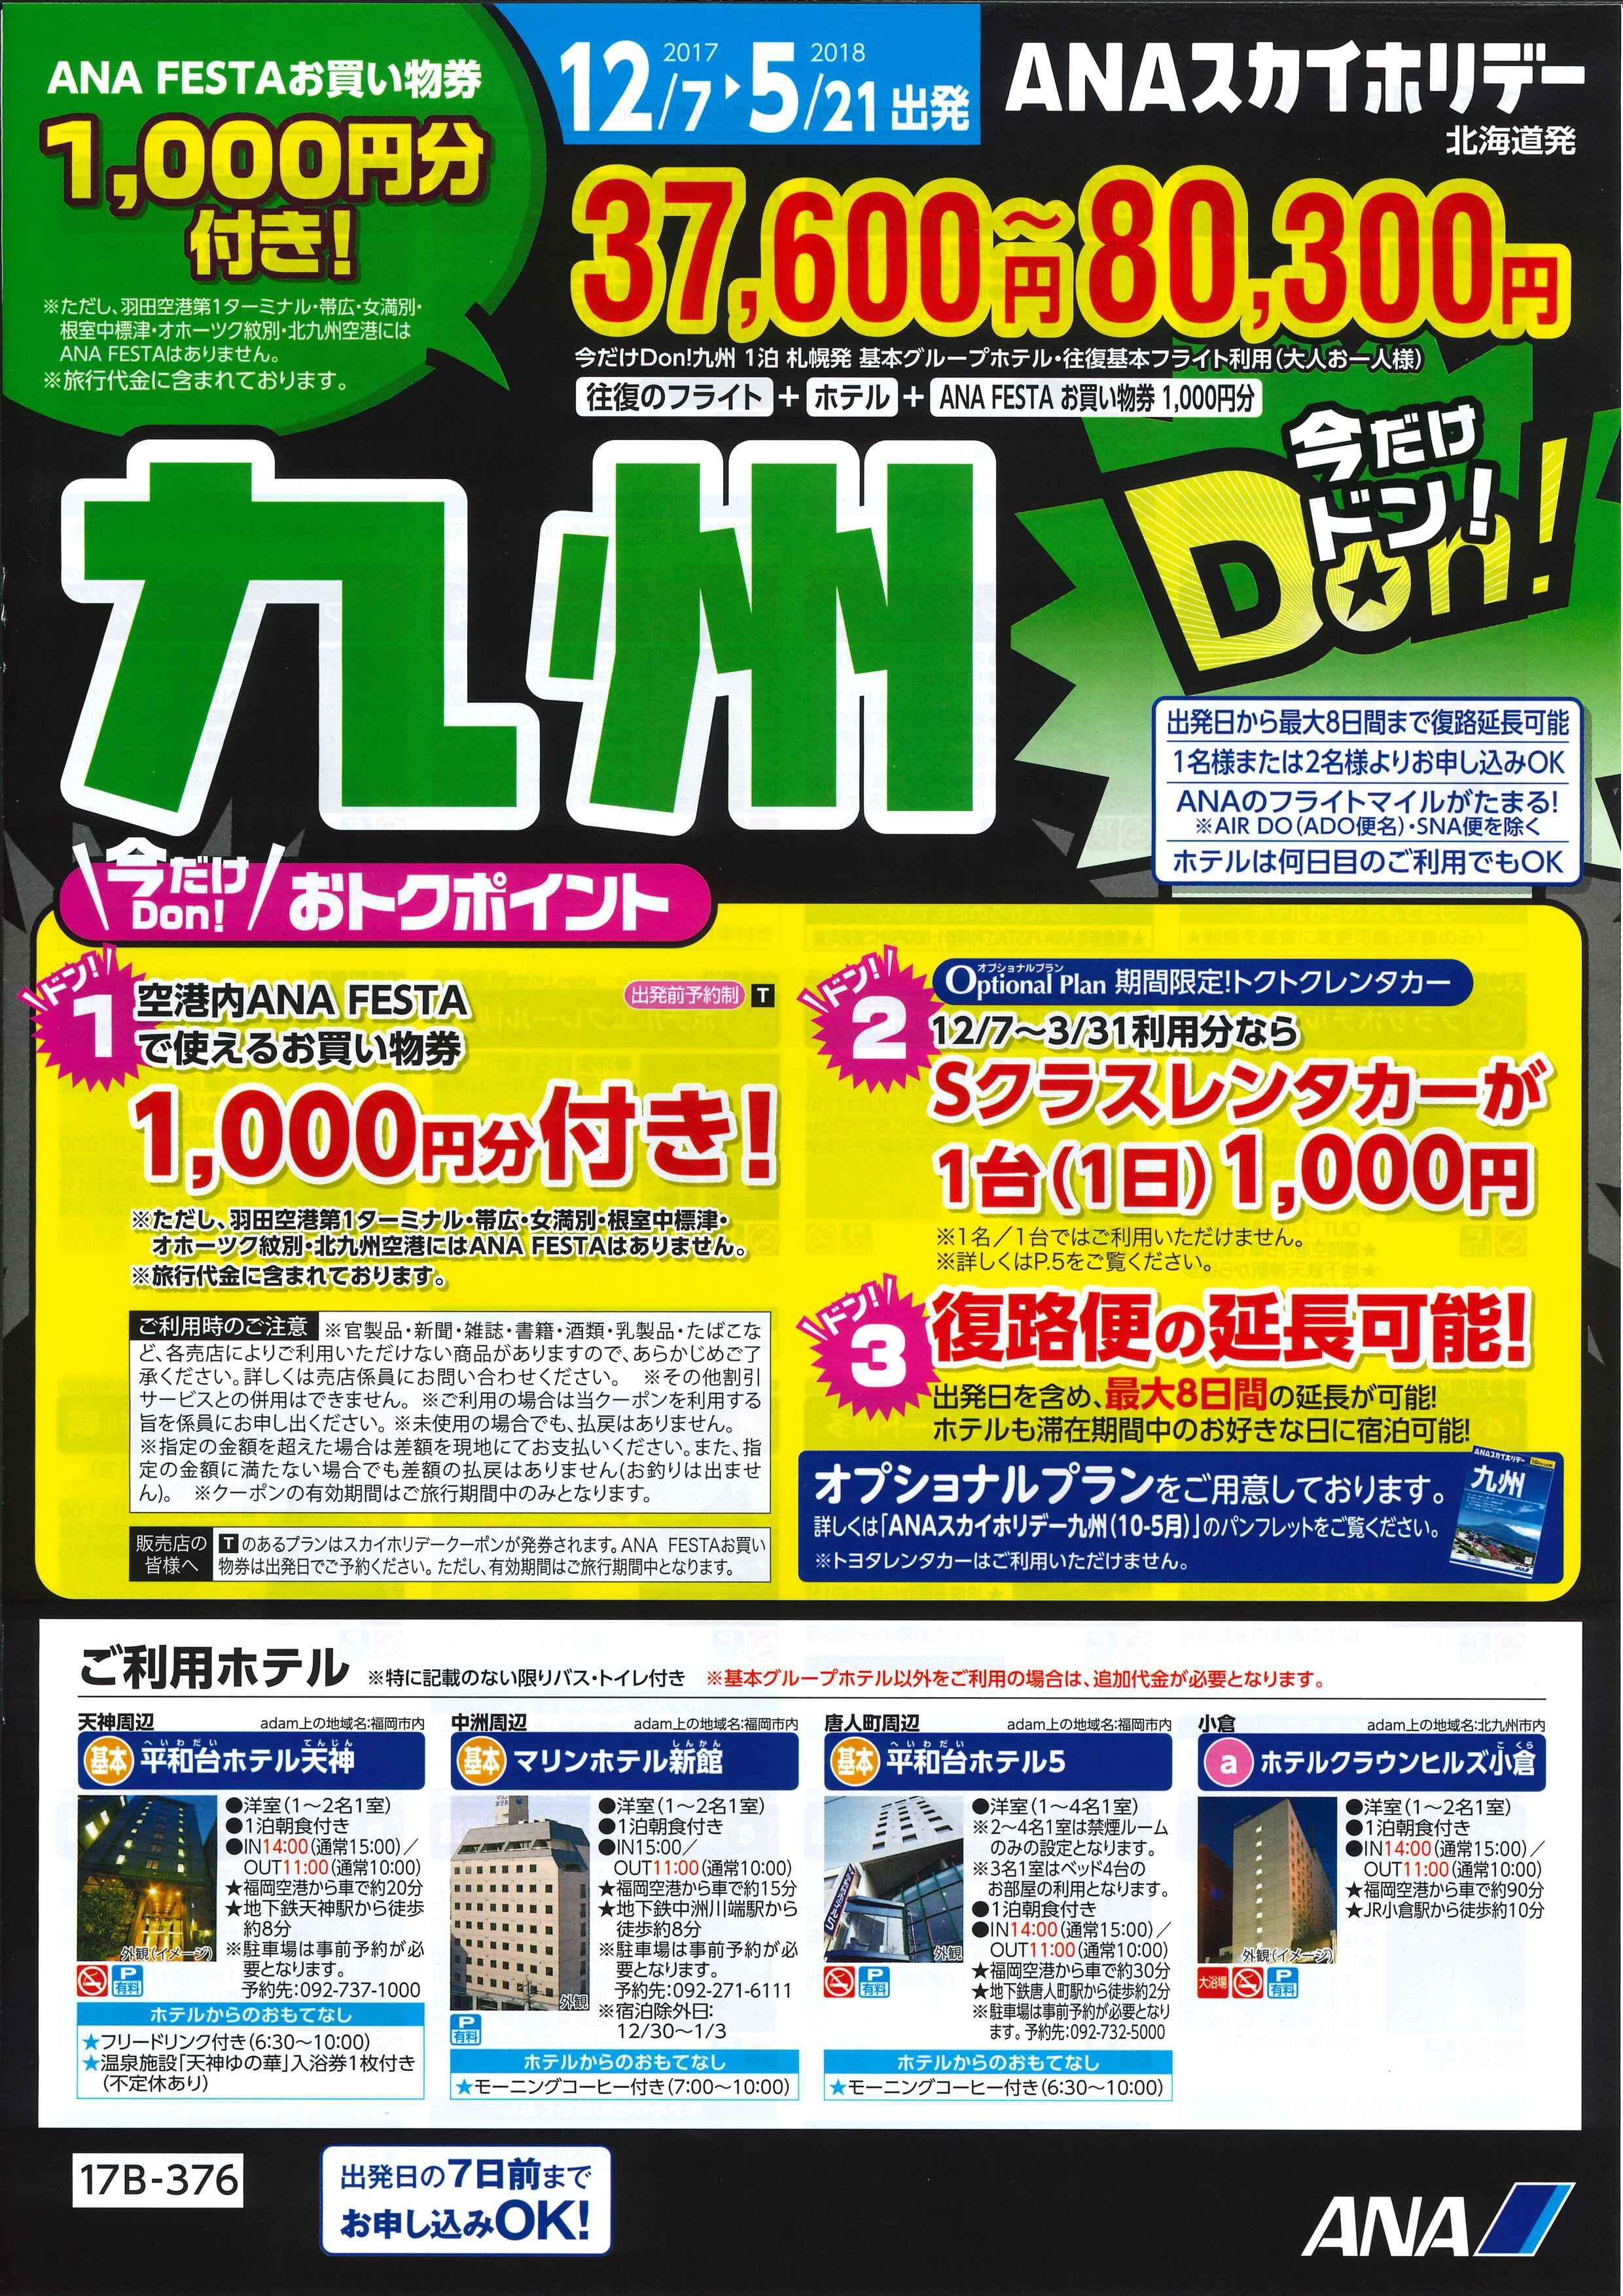 http://www.nakashibetsu-airport.jp/%E4%B9%9D%E5%B7%9E.jpg